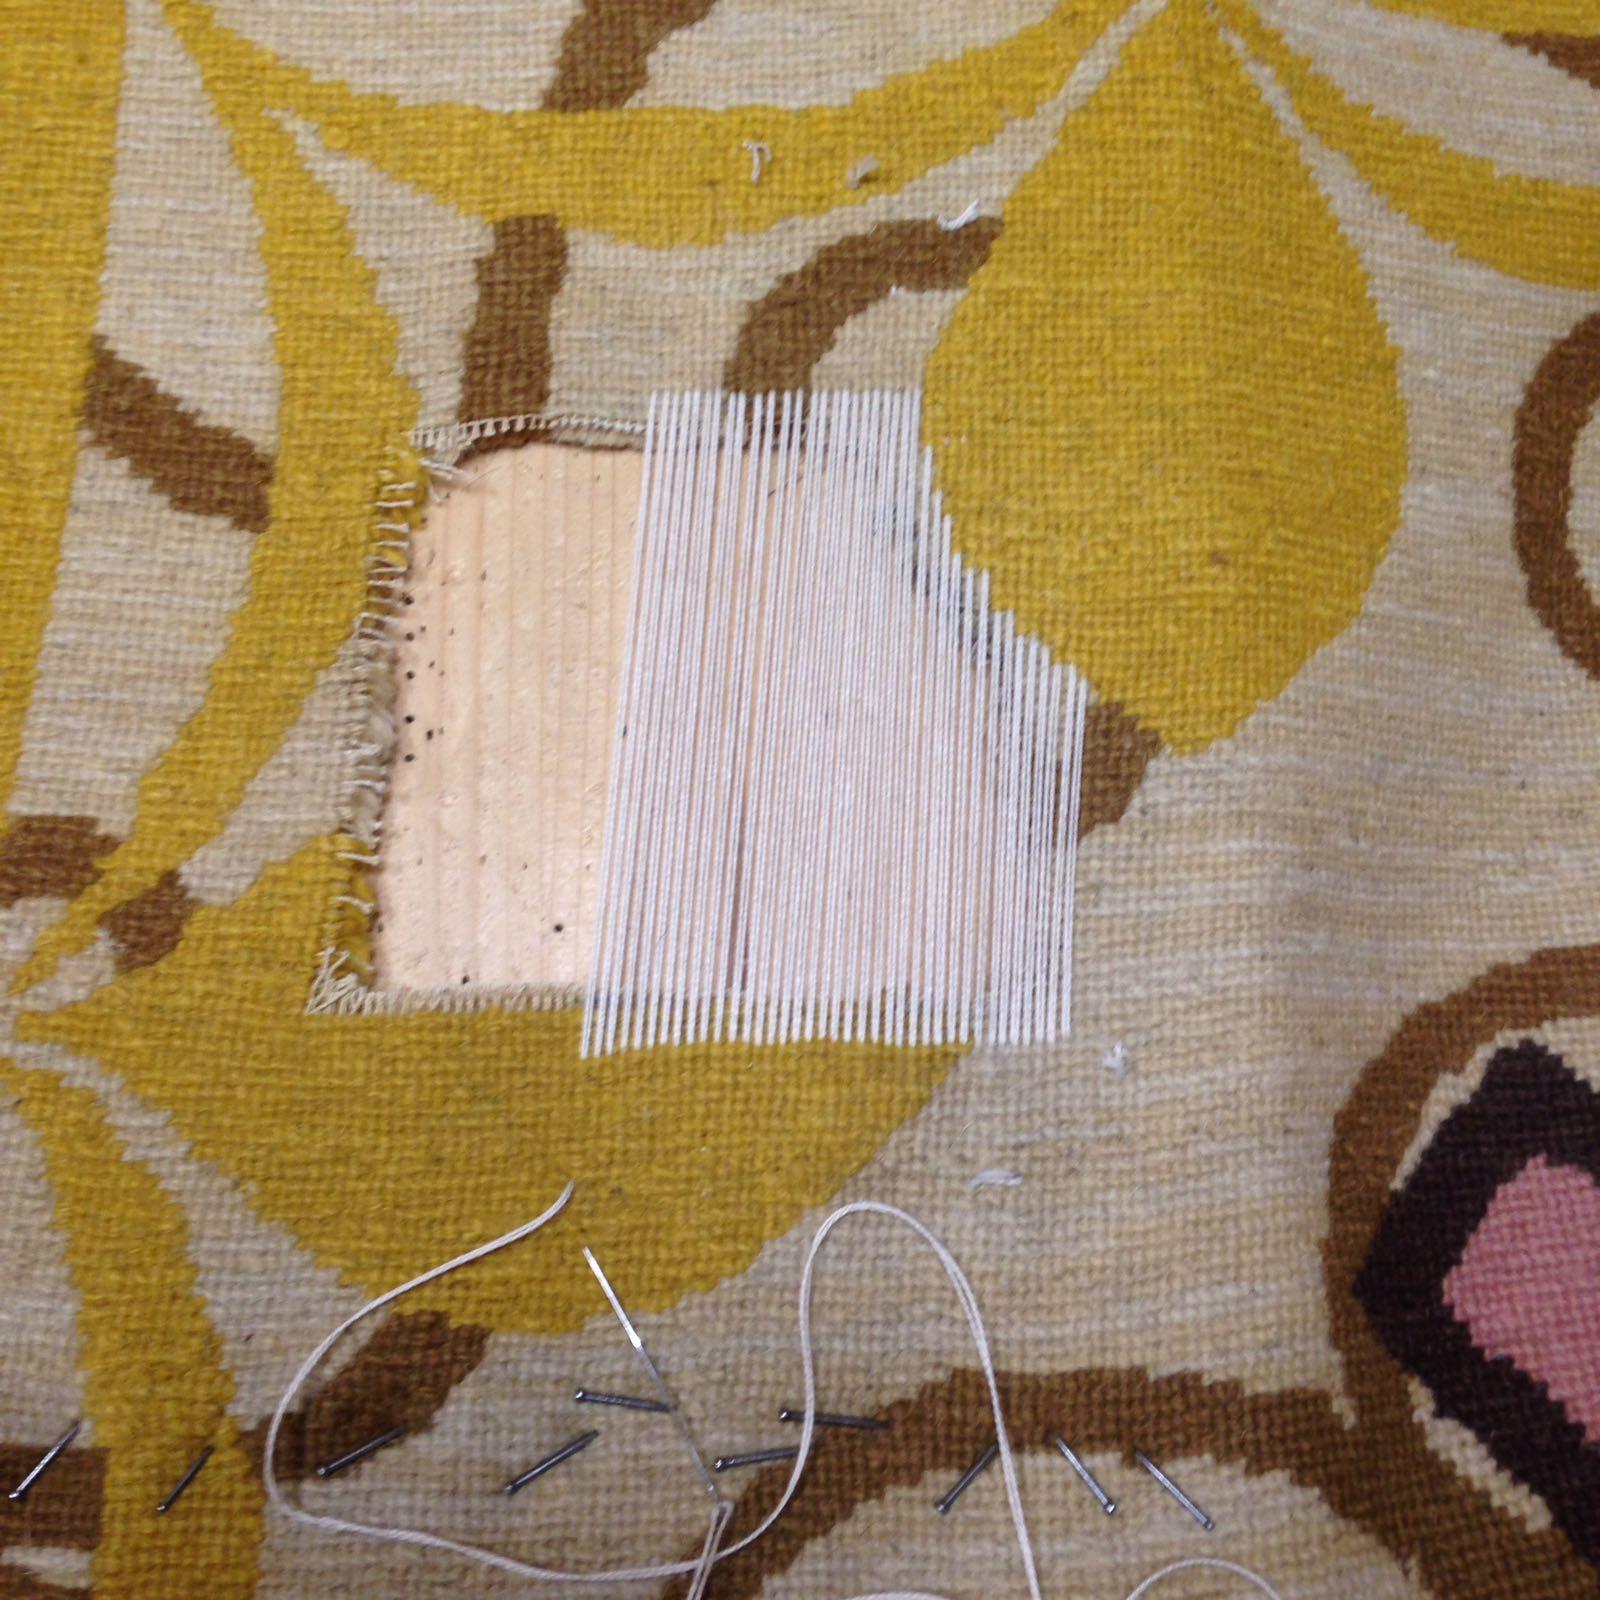 Riparazione tappeti pregiati